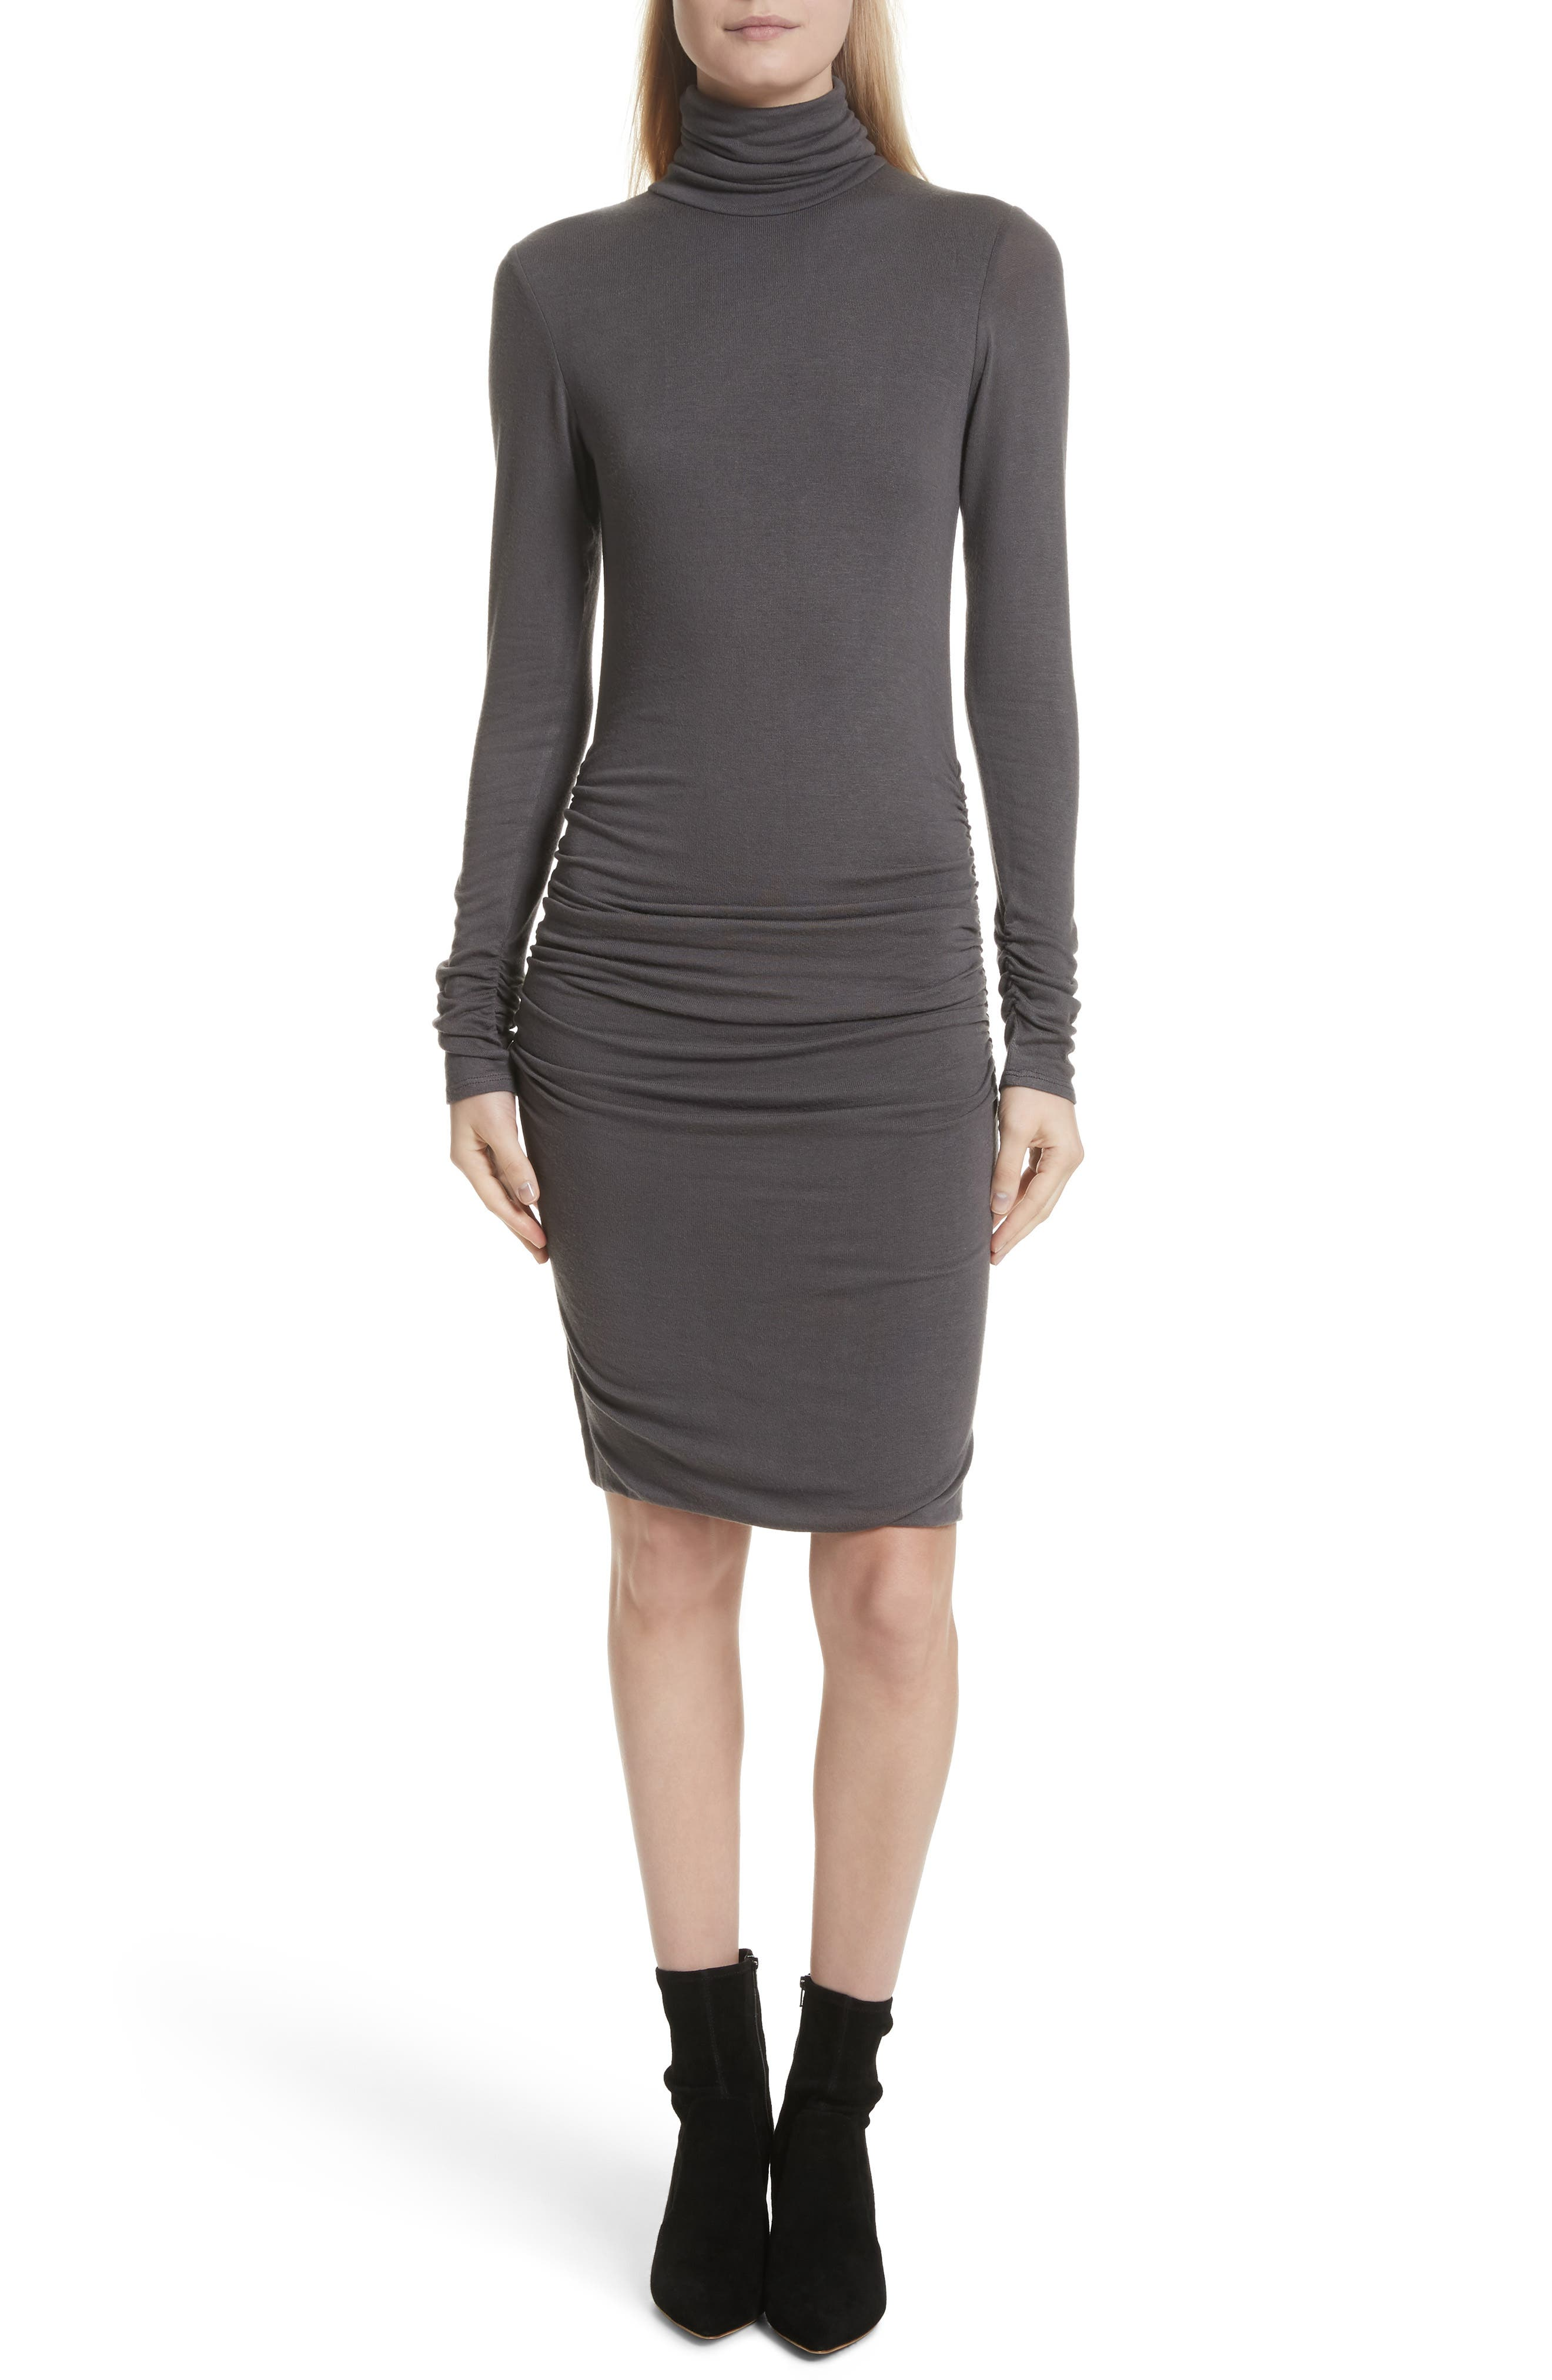 TWENTY Body-Con Turtleneck Dress, Main, color, 021